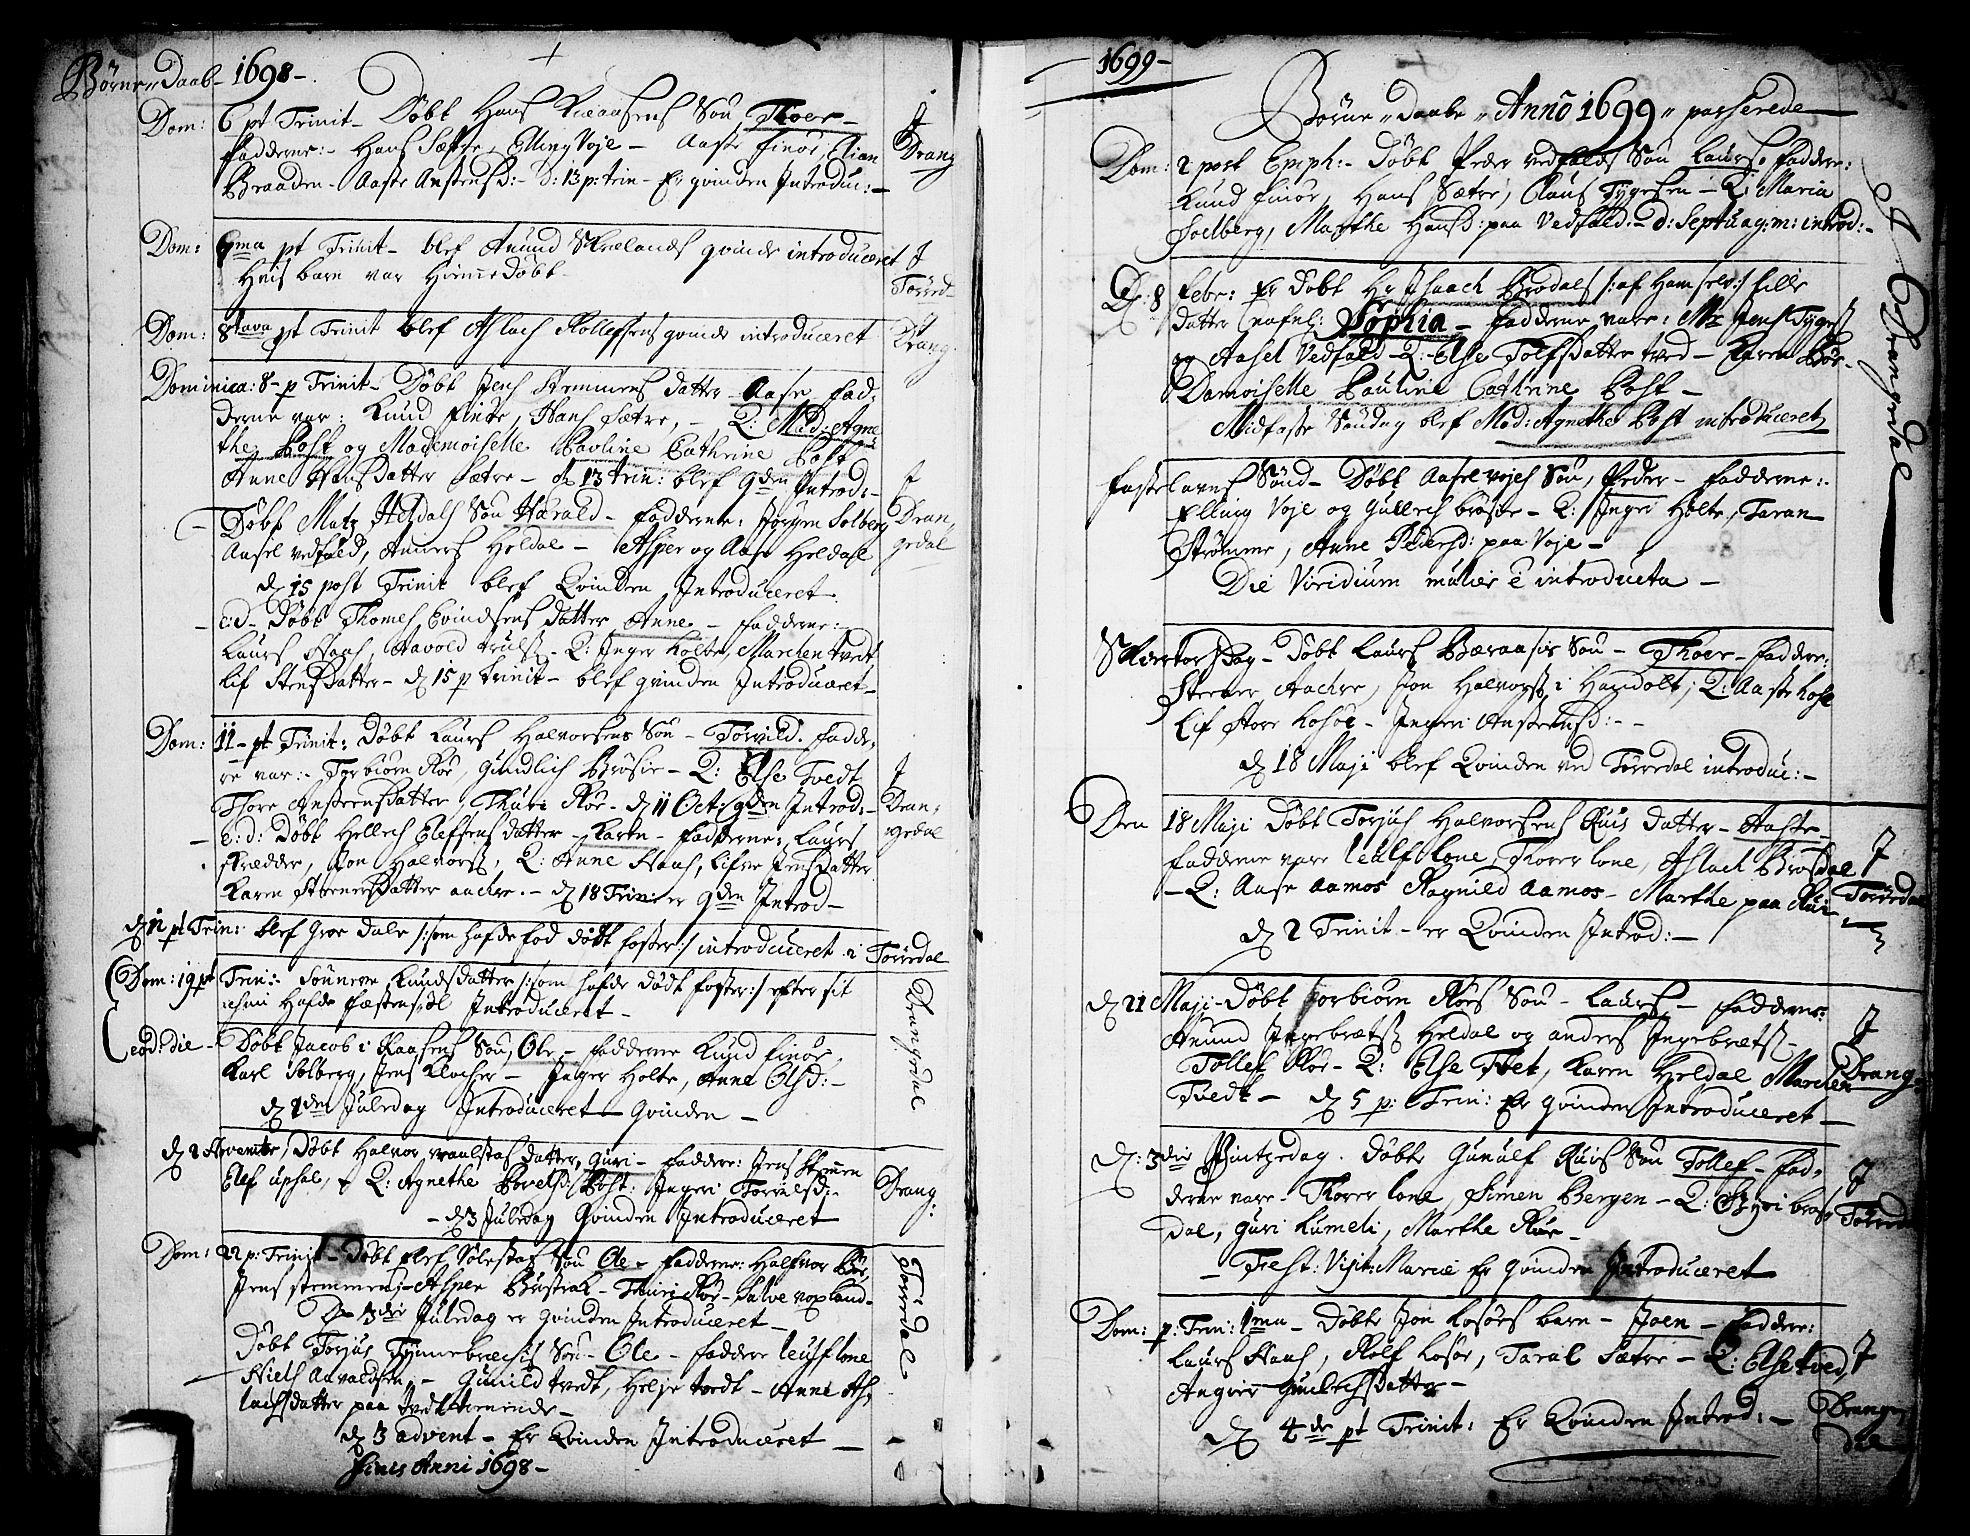 SAKO, Drangedal kirkebøker, F/Fa/L0001: Ministerialbok nr. 1, 1697-1767, s. 5